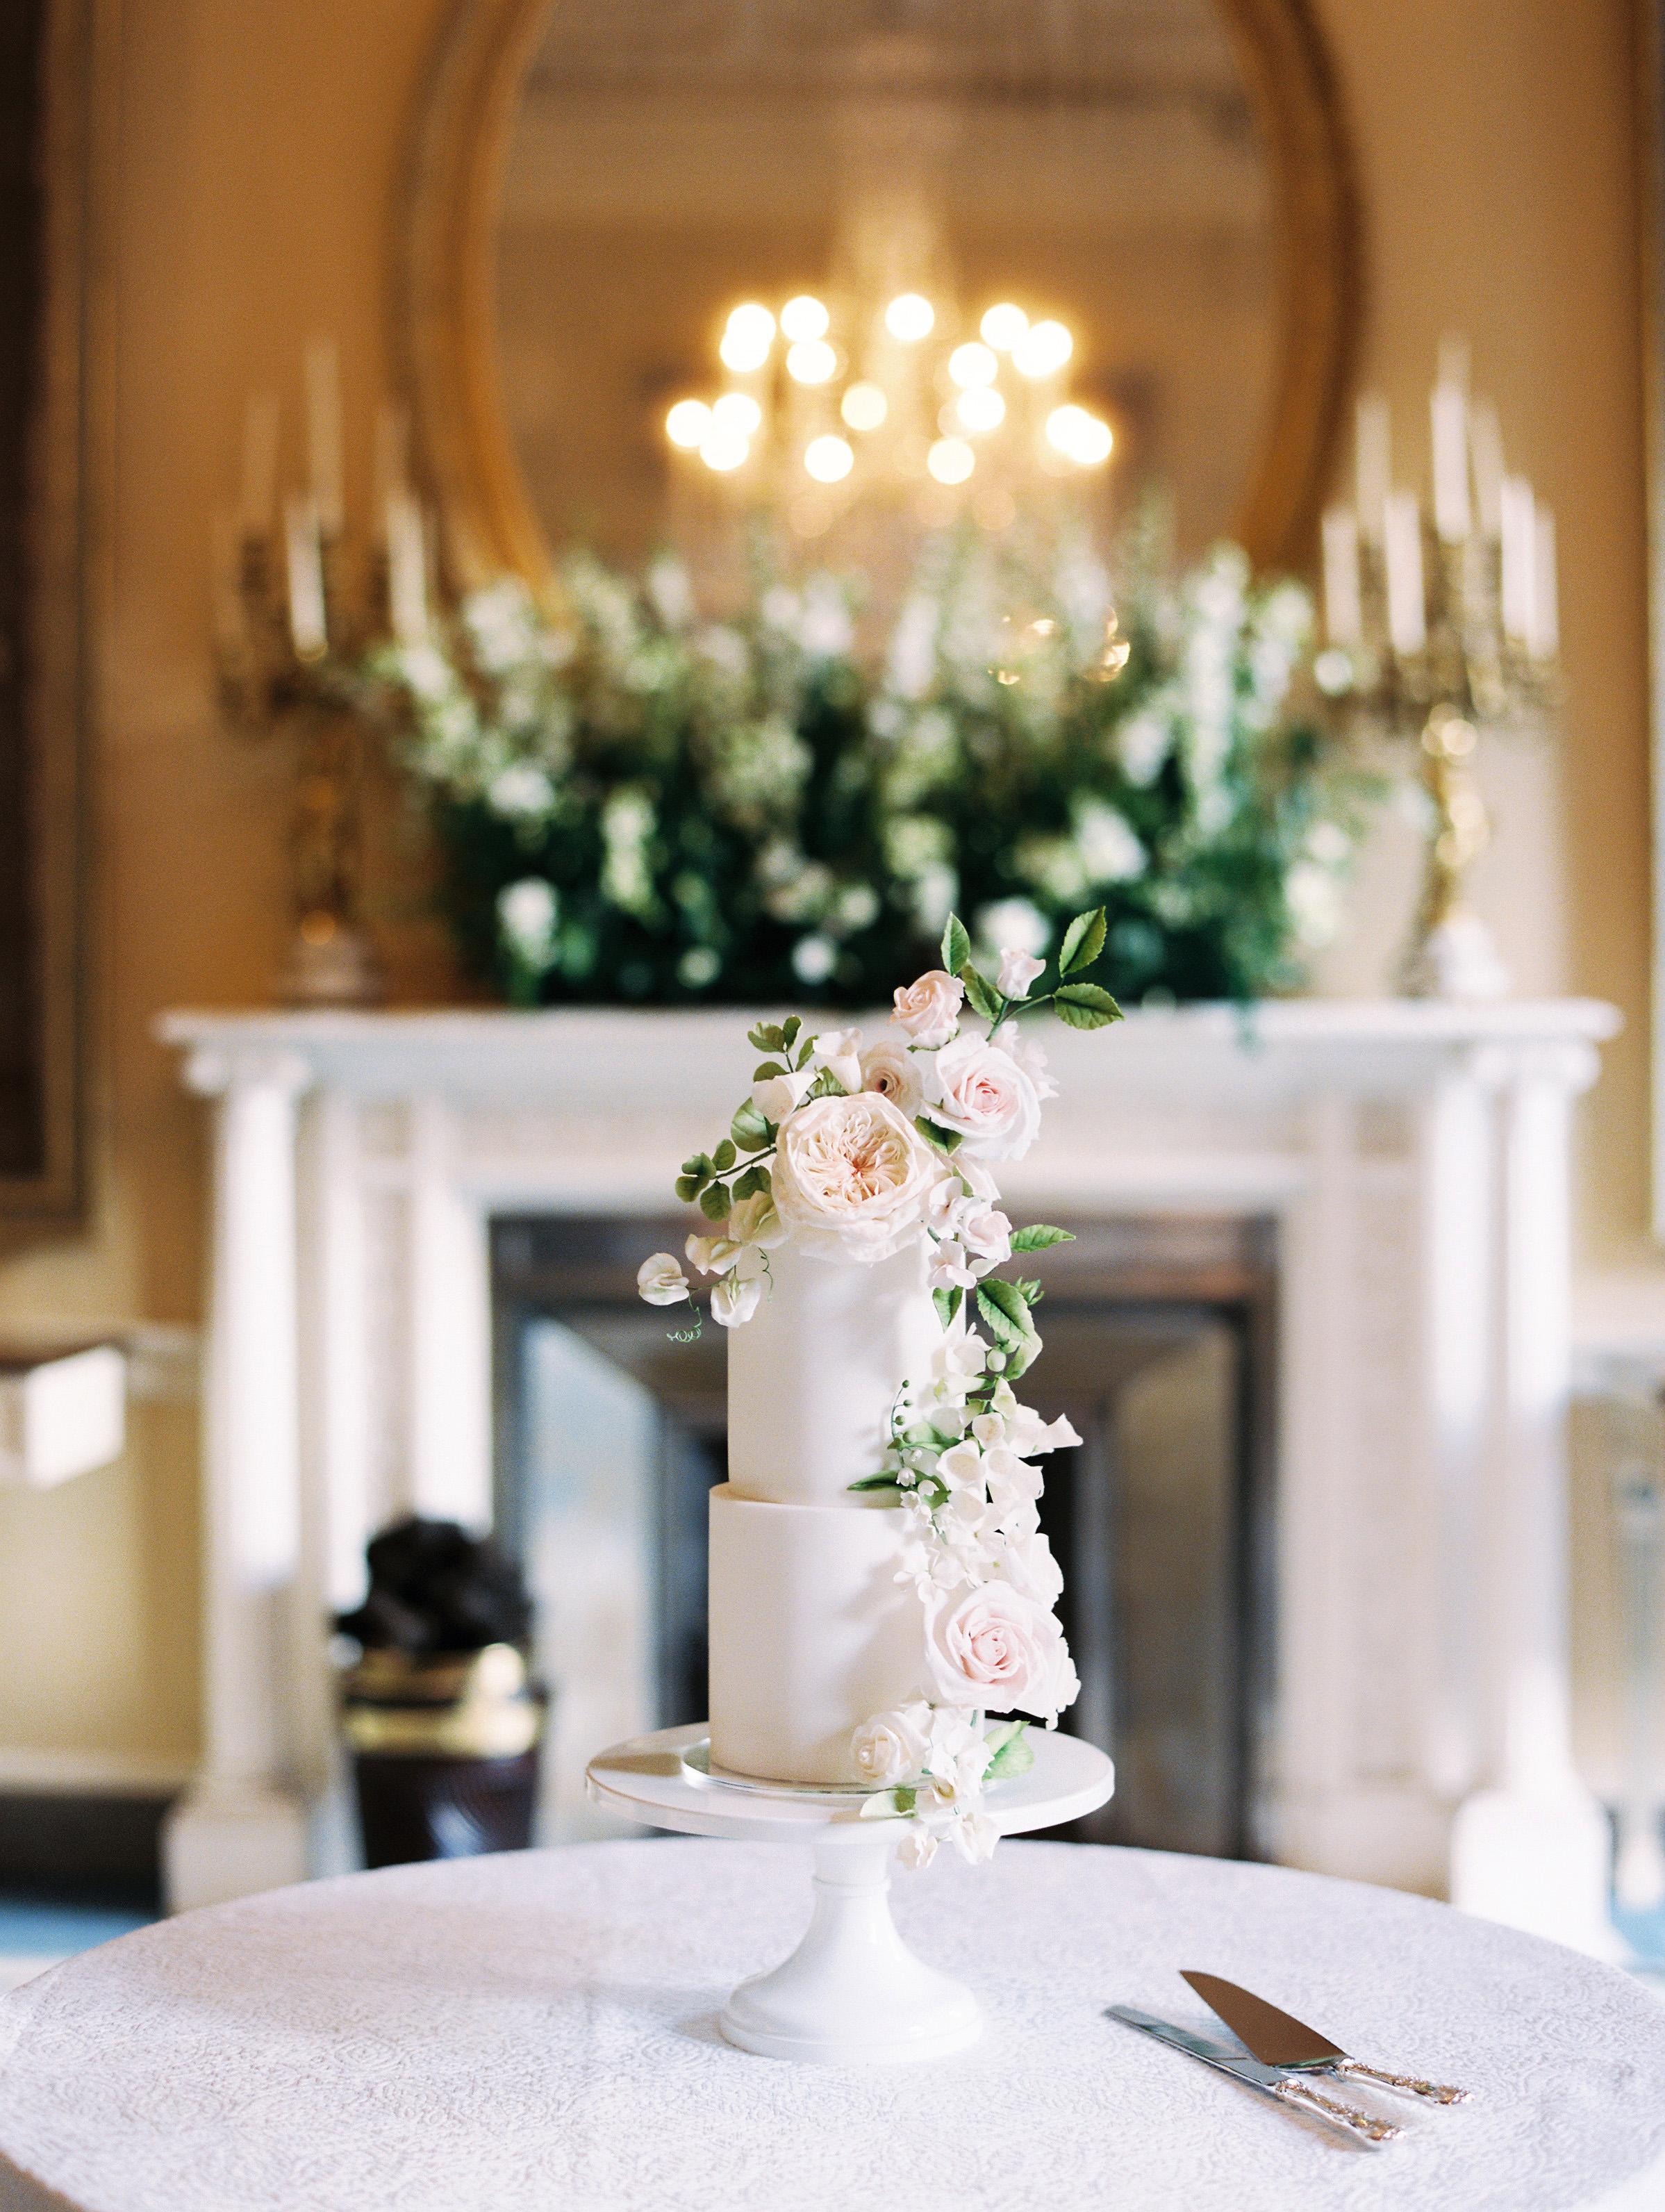 ramsey charles ireland wedding cake with flower adornments